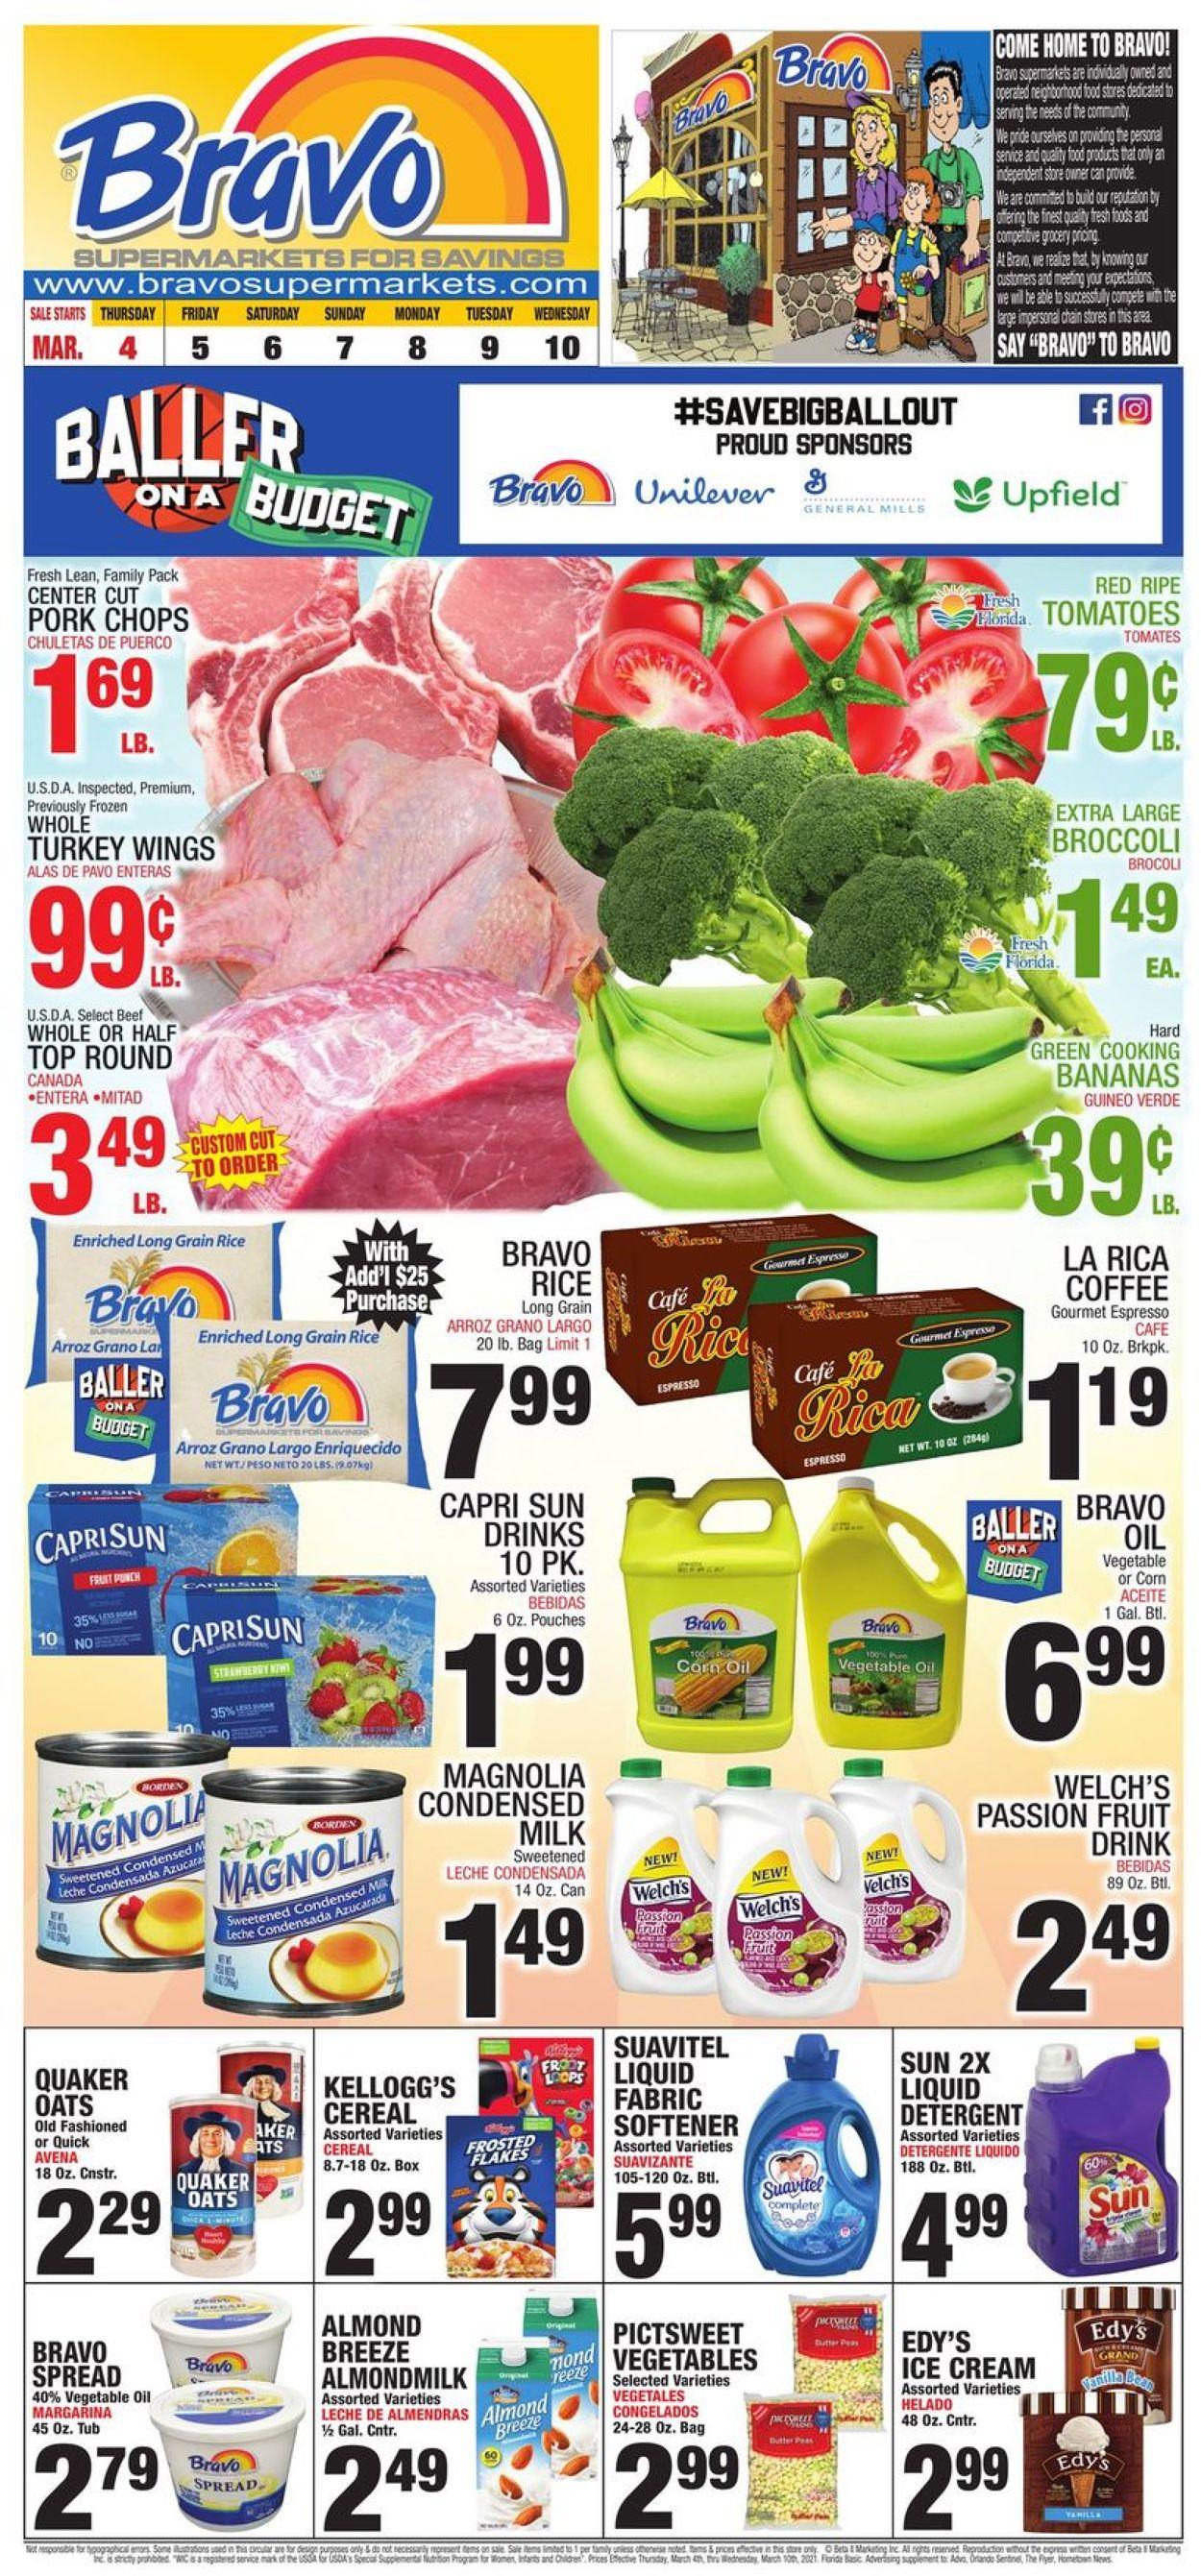 Bravo Supermarkets Weekly Ad Circular - valid 03/04-03/10/2021